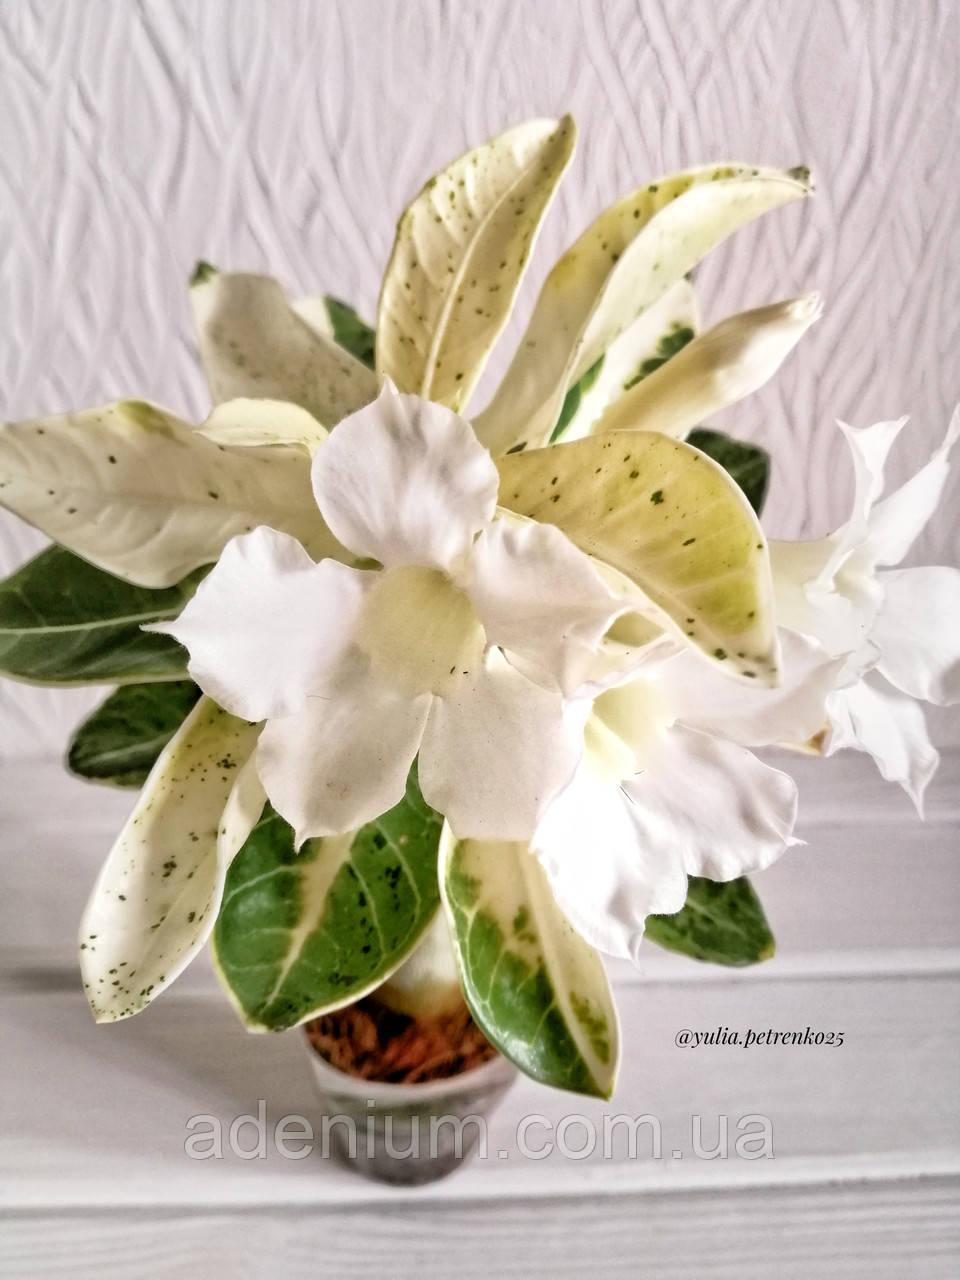 Аденіум Raffaello (молоде рослина, вариегатный)